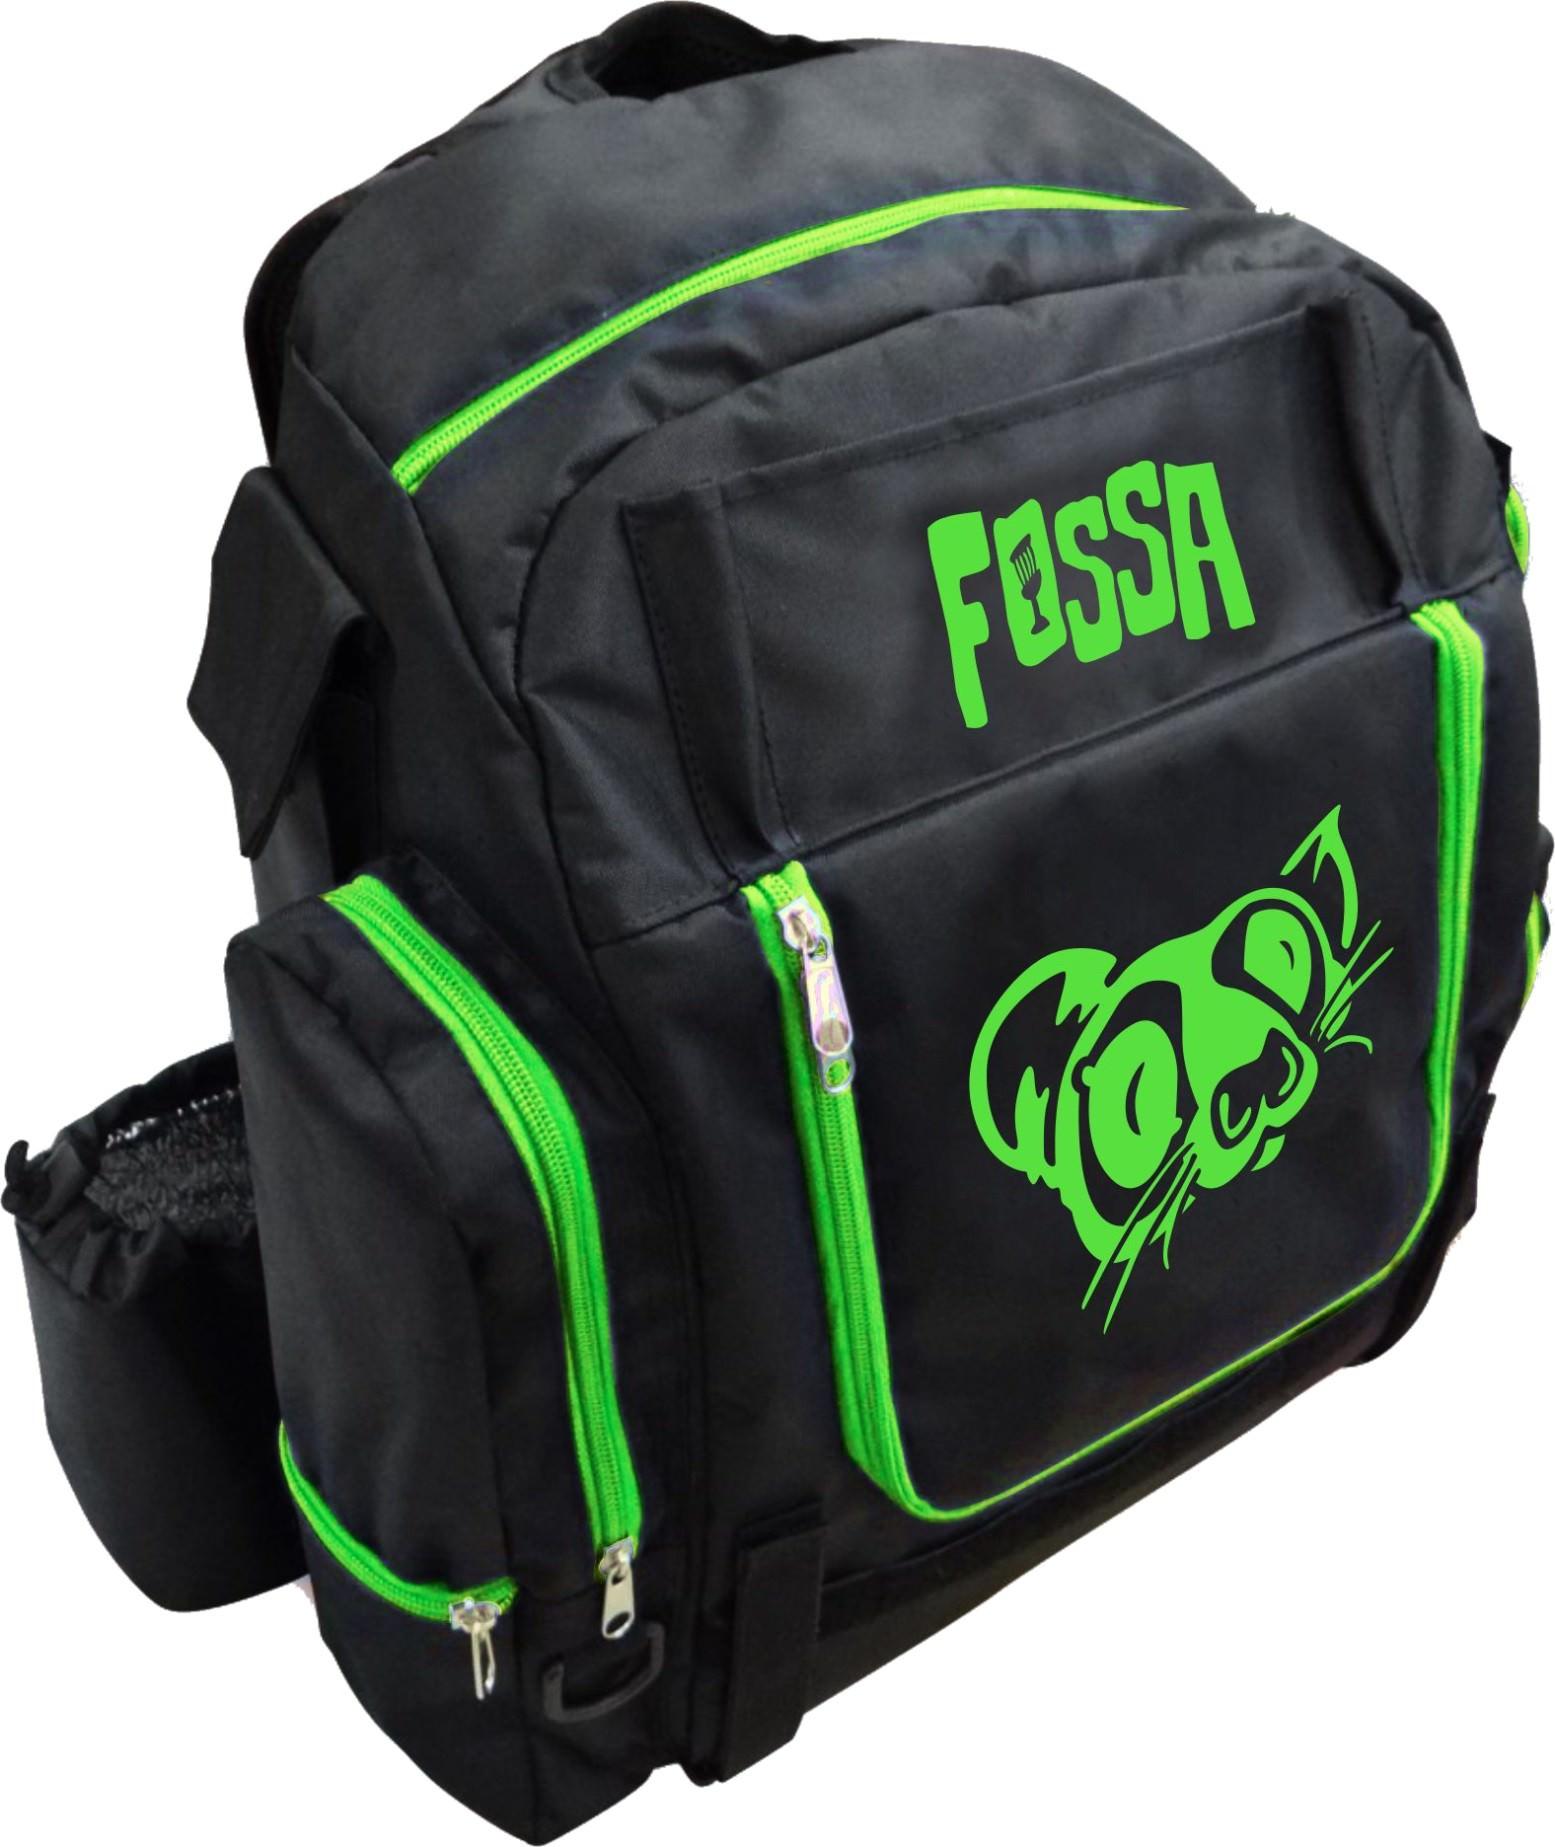 Fossa Tana Backpack Bag